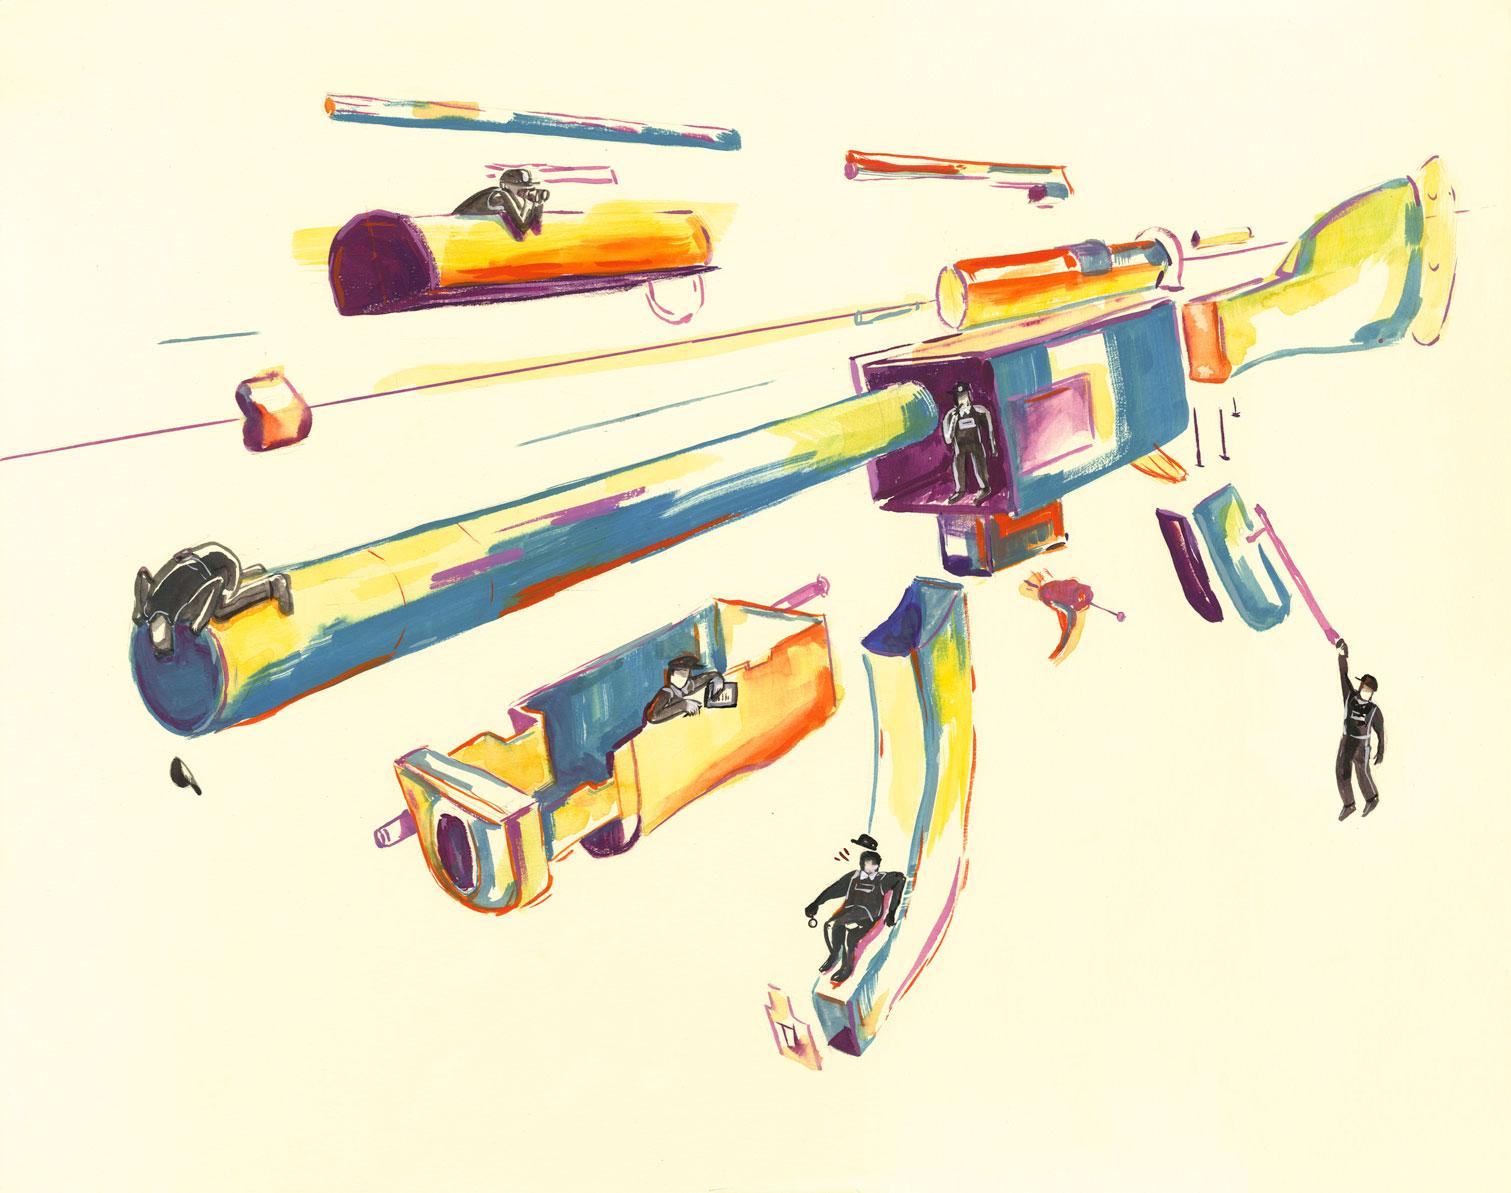 Illustration by Evelyn Roitner